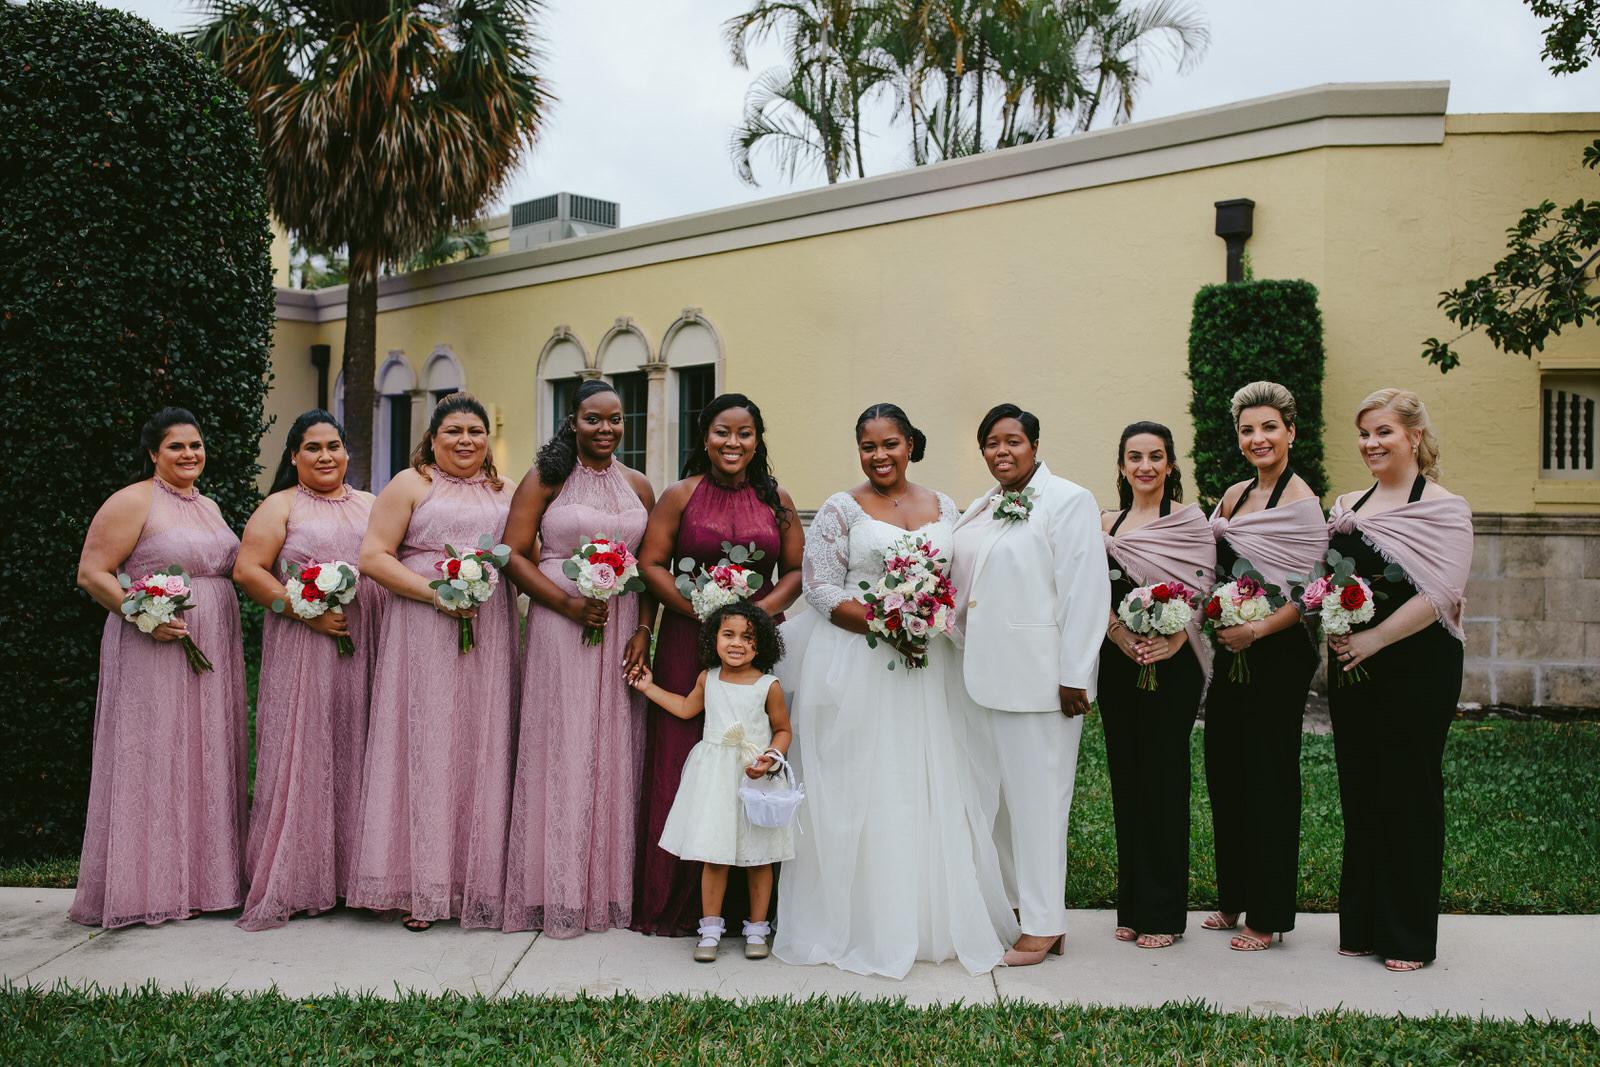 Benvenuto_Wedding_Tiny_House_Photo_Wedding_Party_Outside.jpg